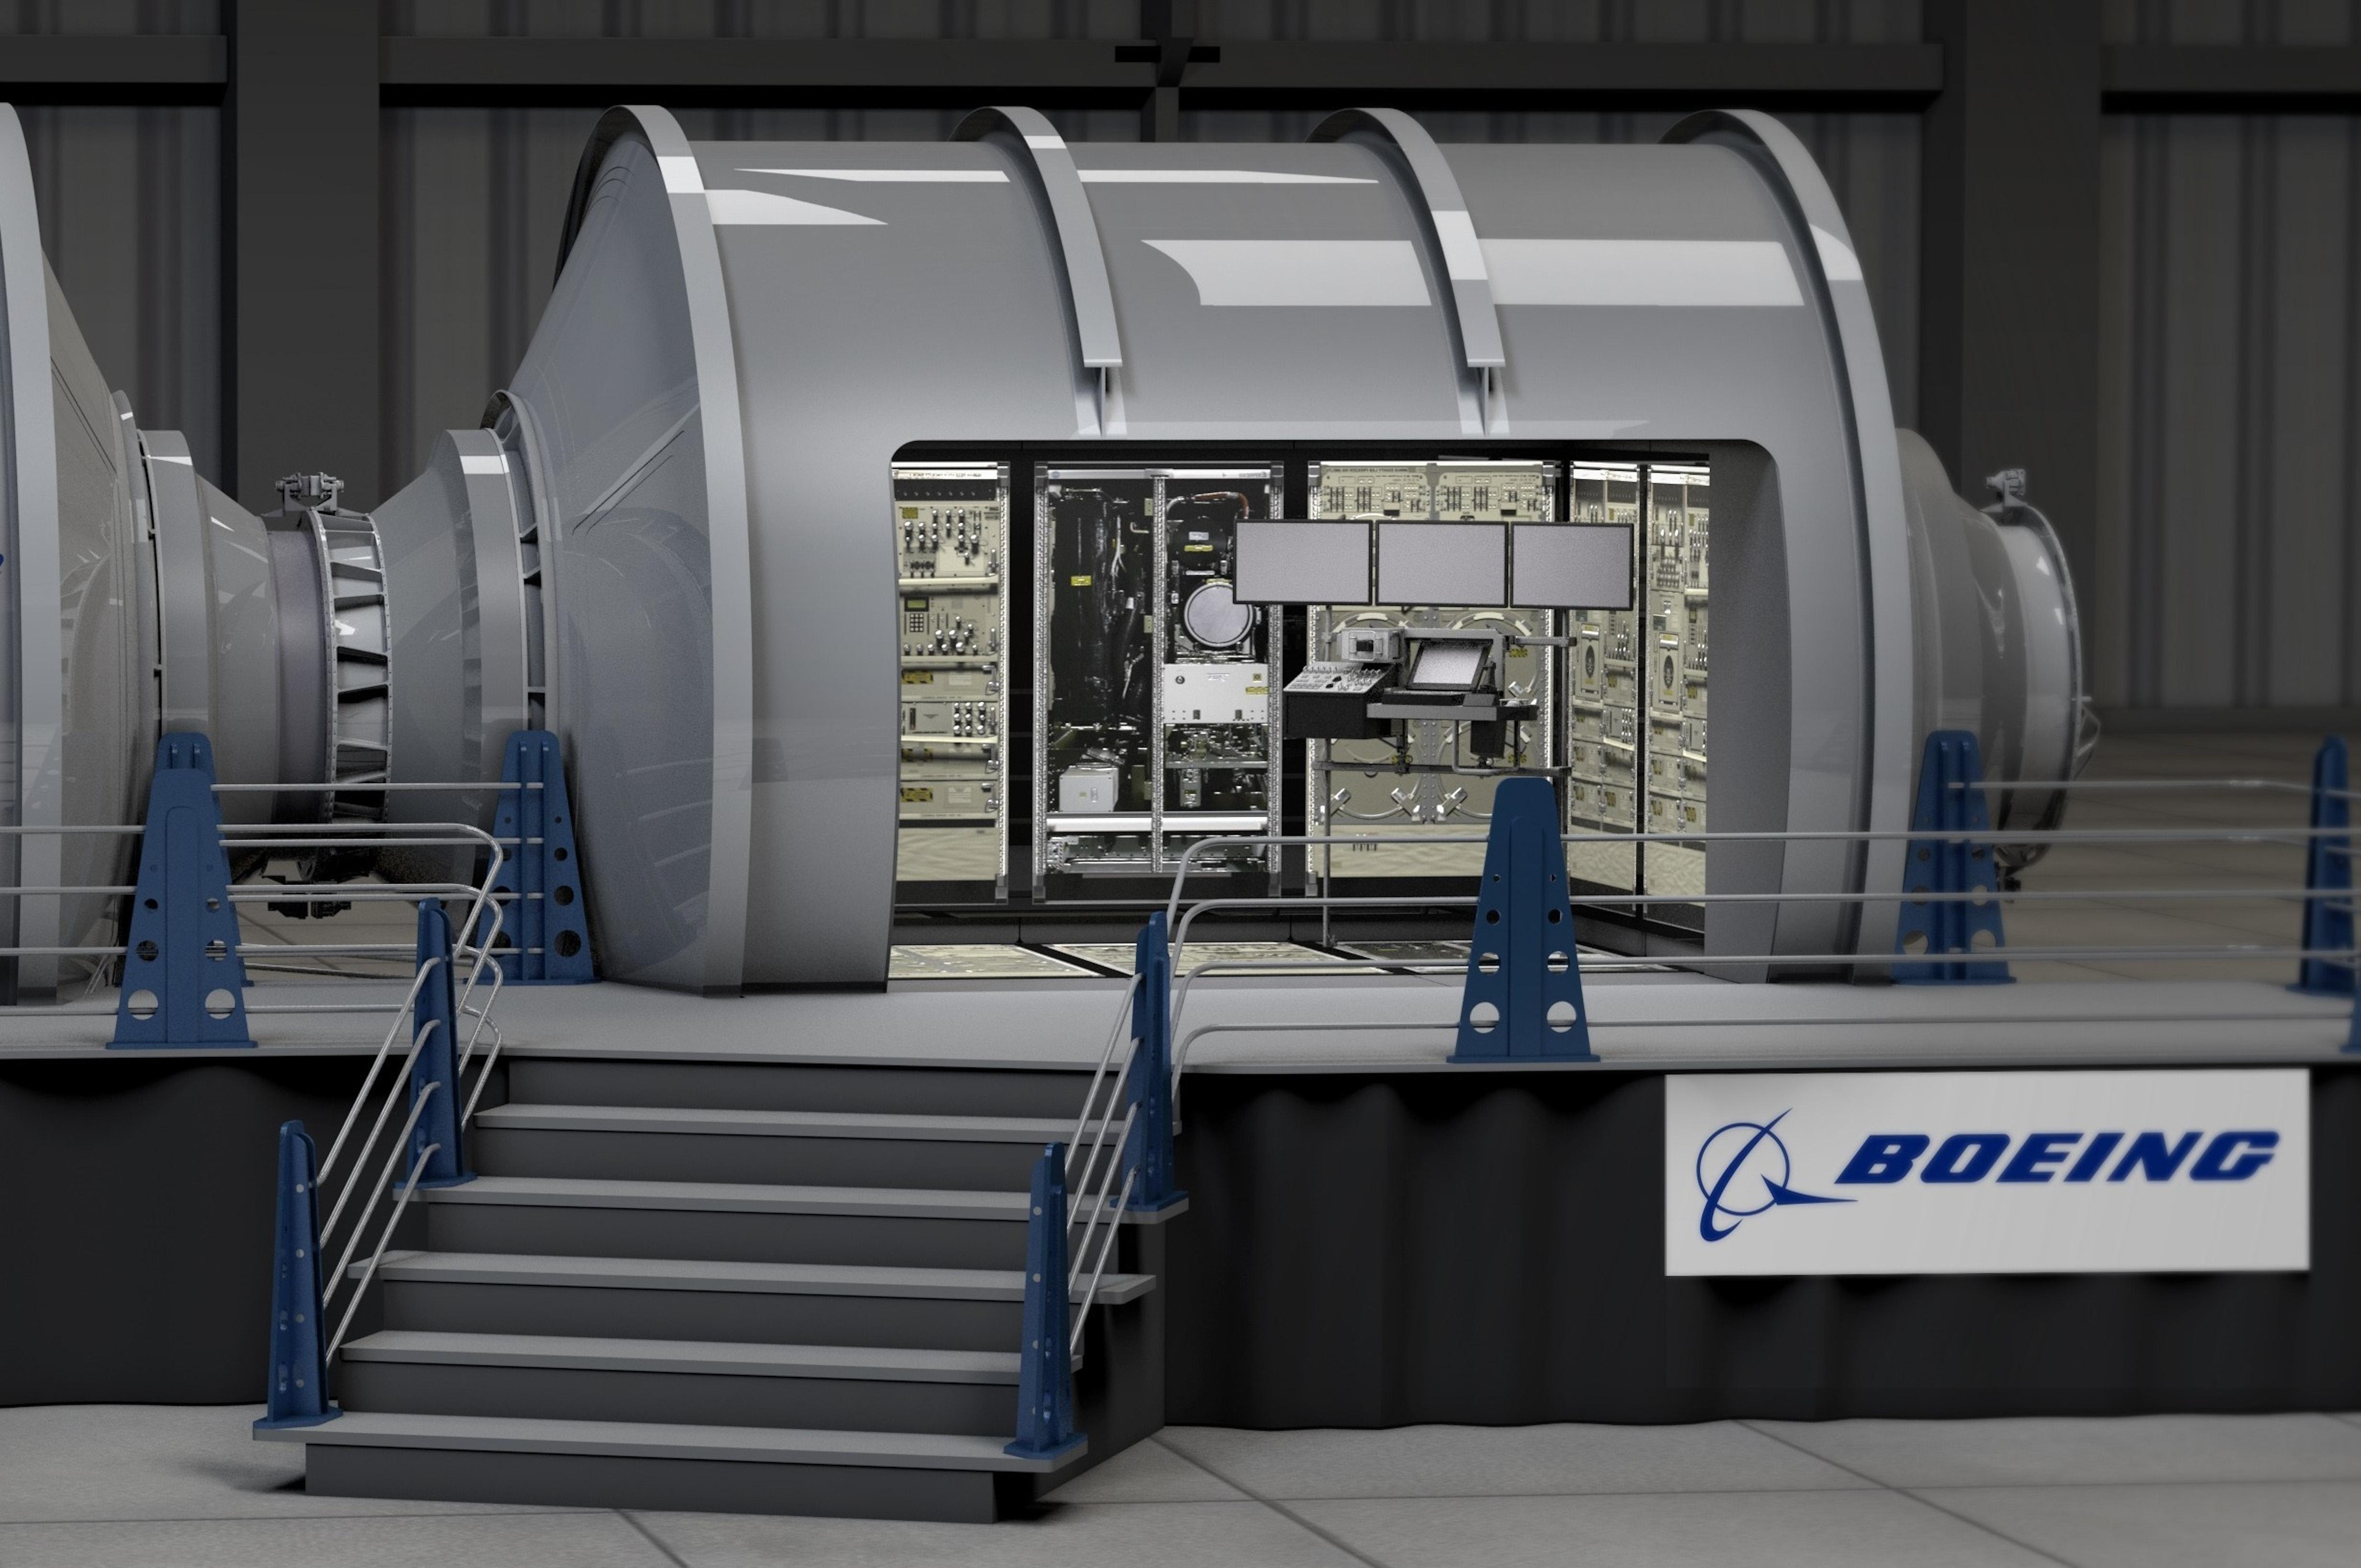 Concept image of Boeing's prototype habitation module.